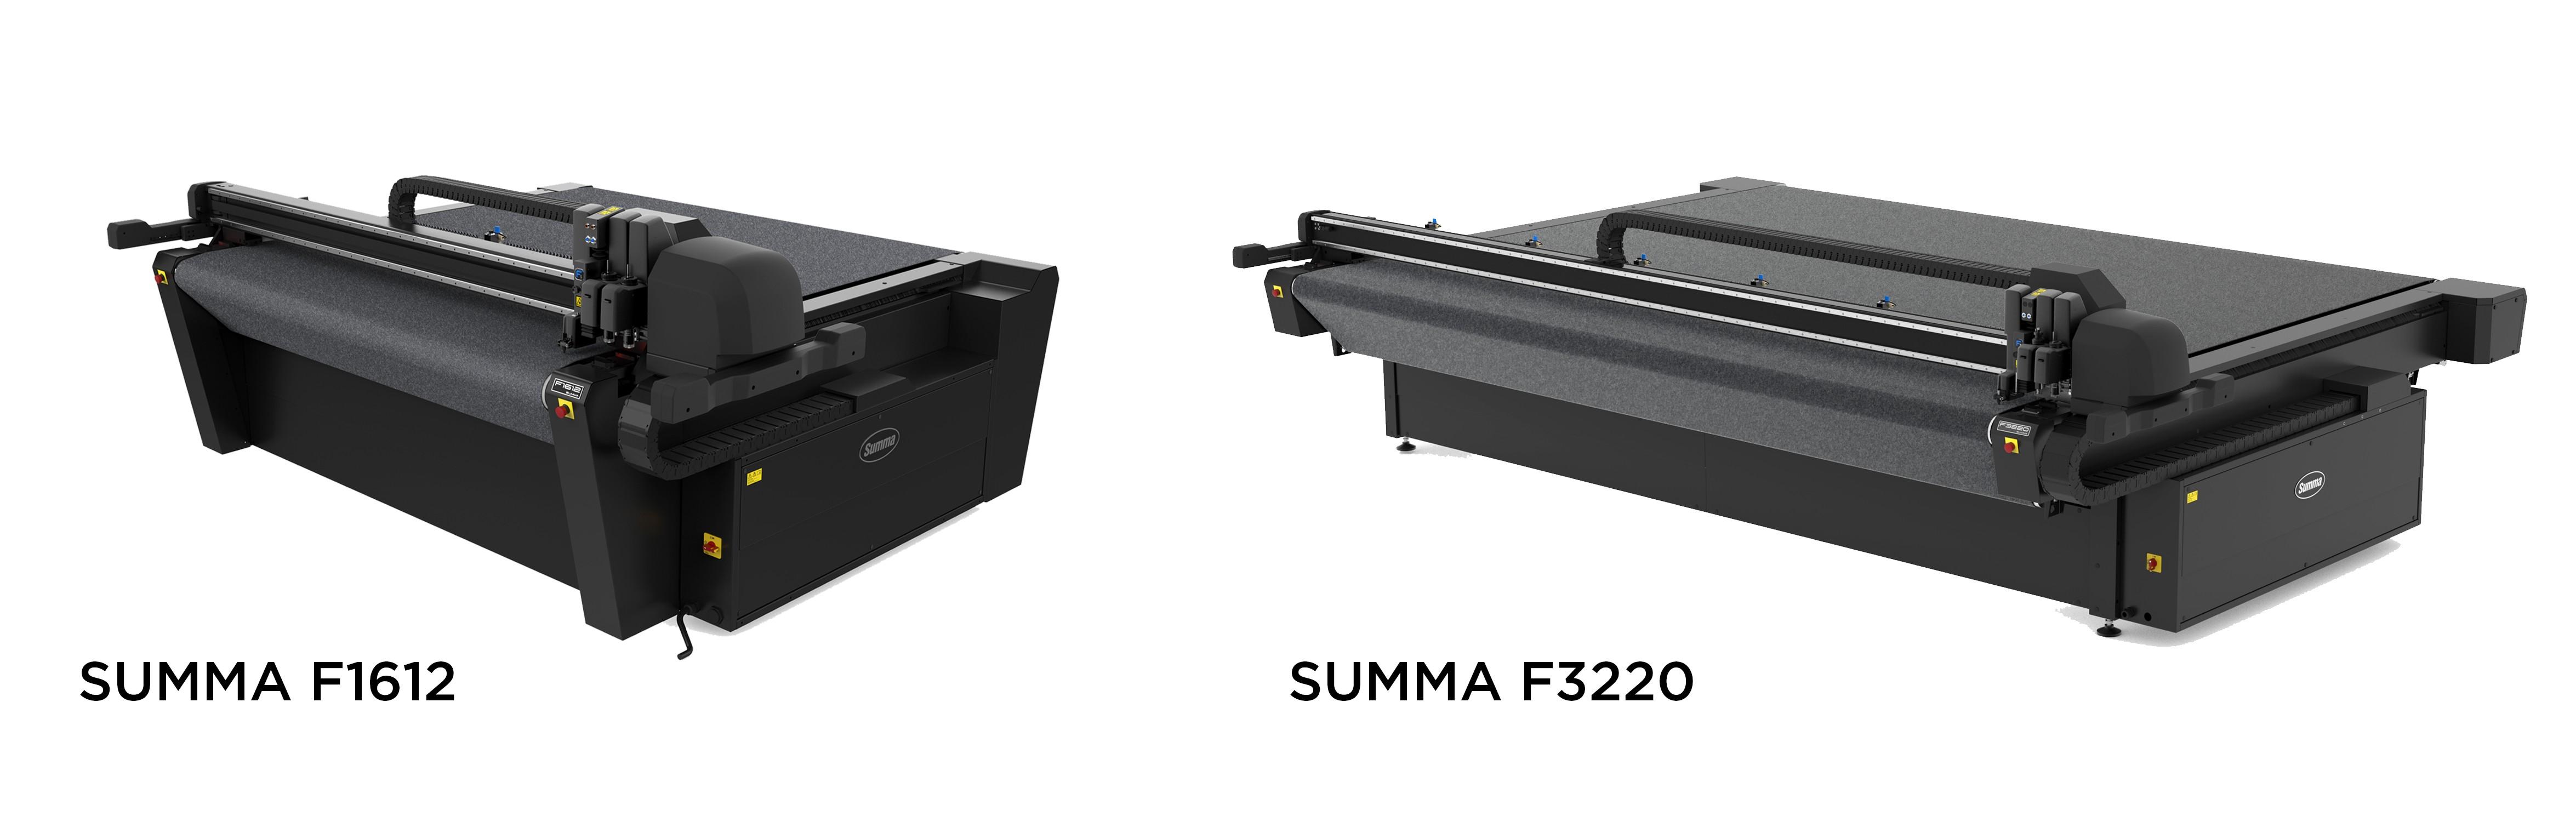 Summa F1612 - Summa F3220